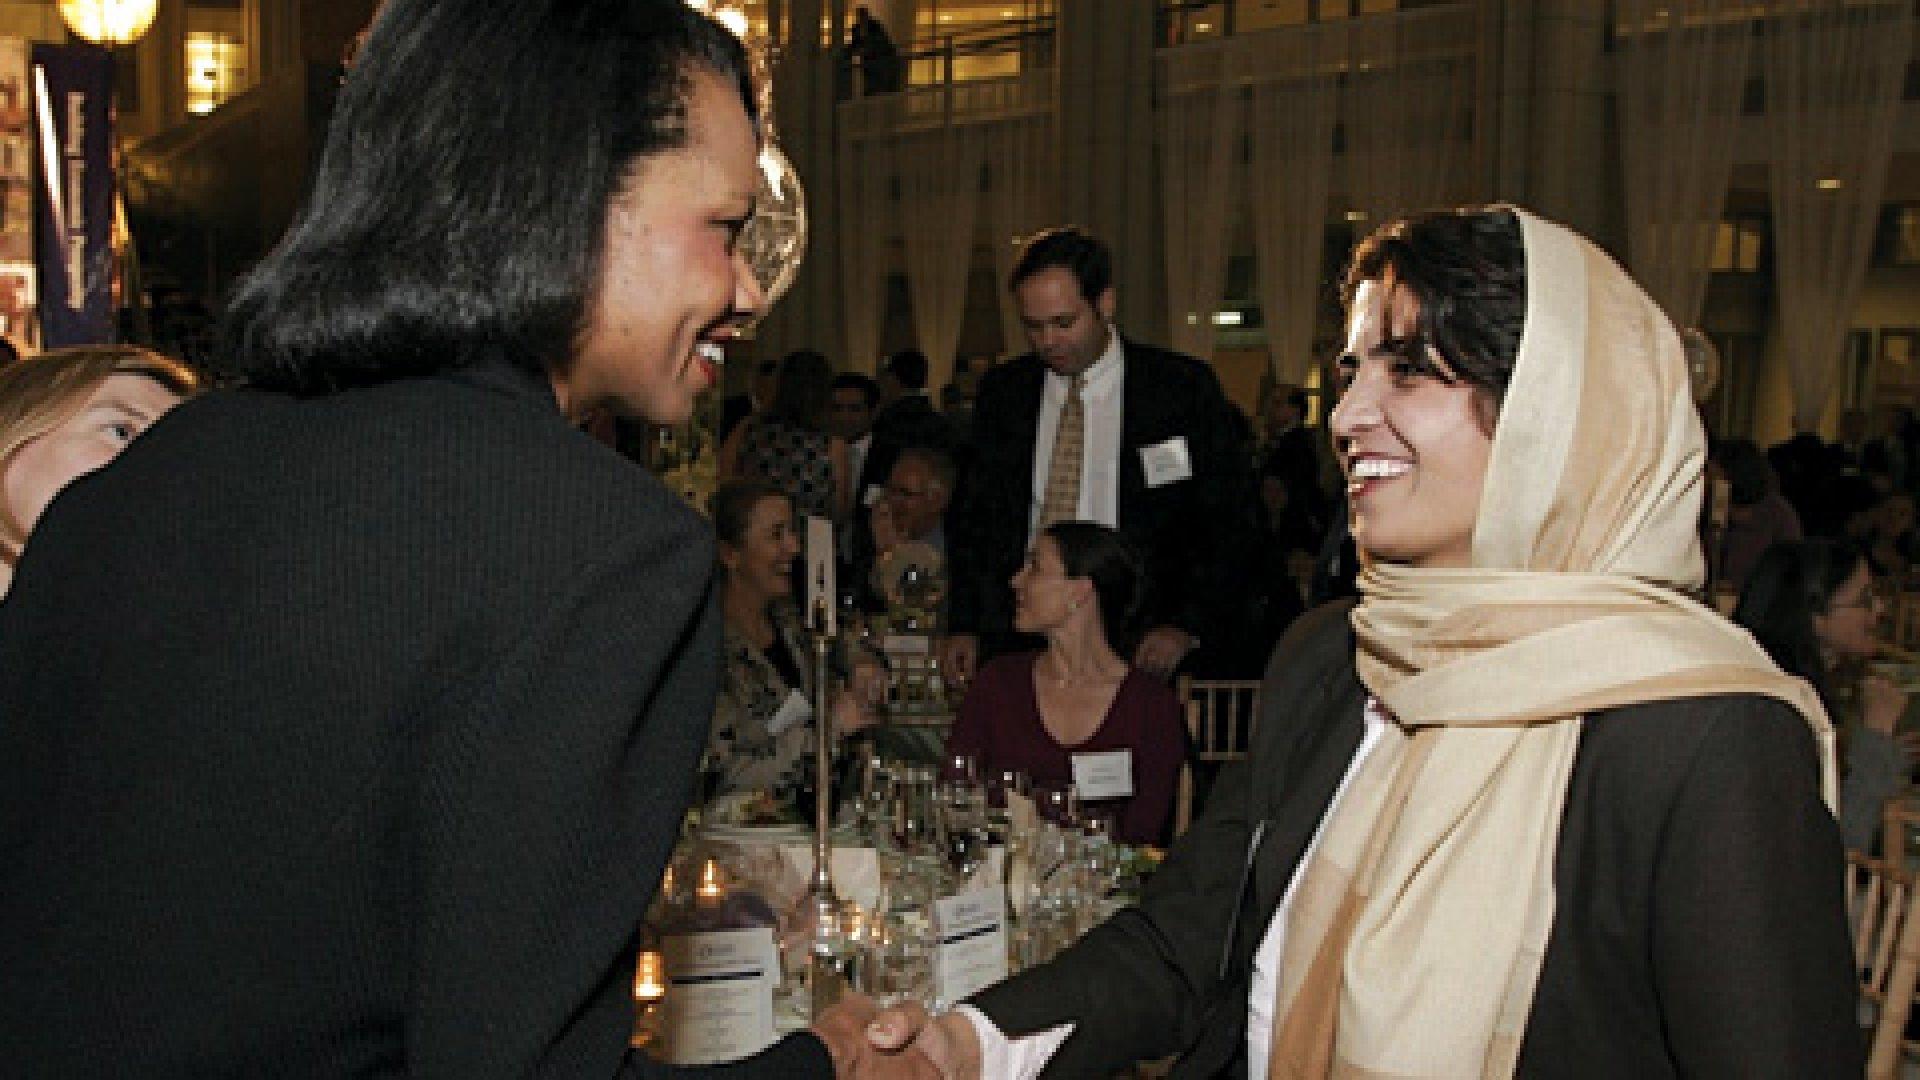 Kamila Sidiqi receiving congratulations from Condoleezza Rice.